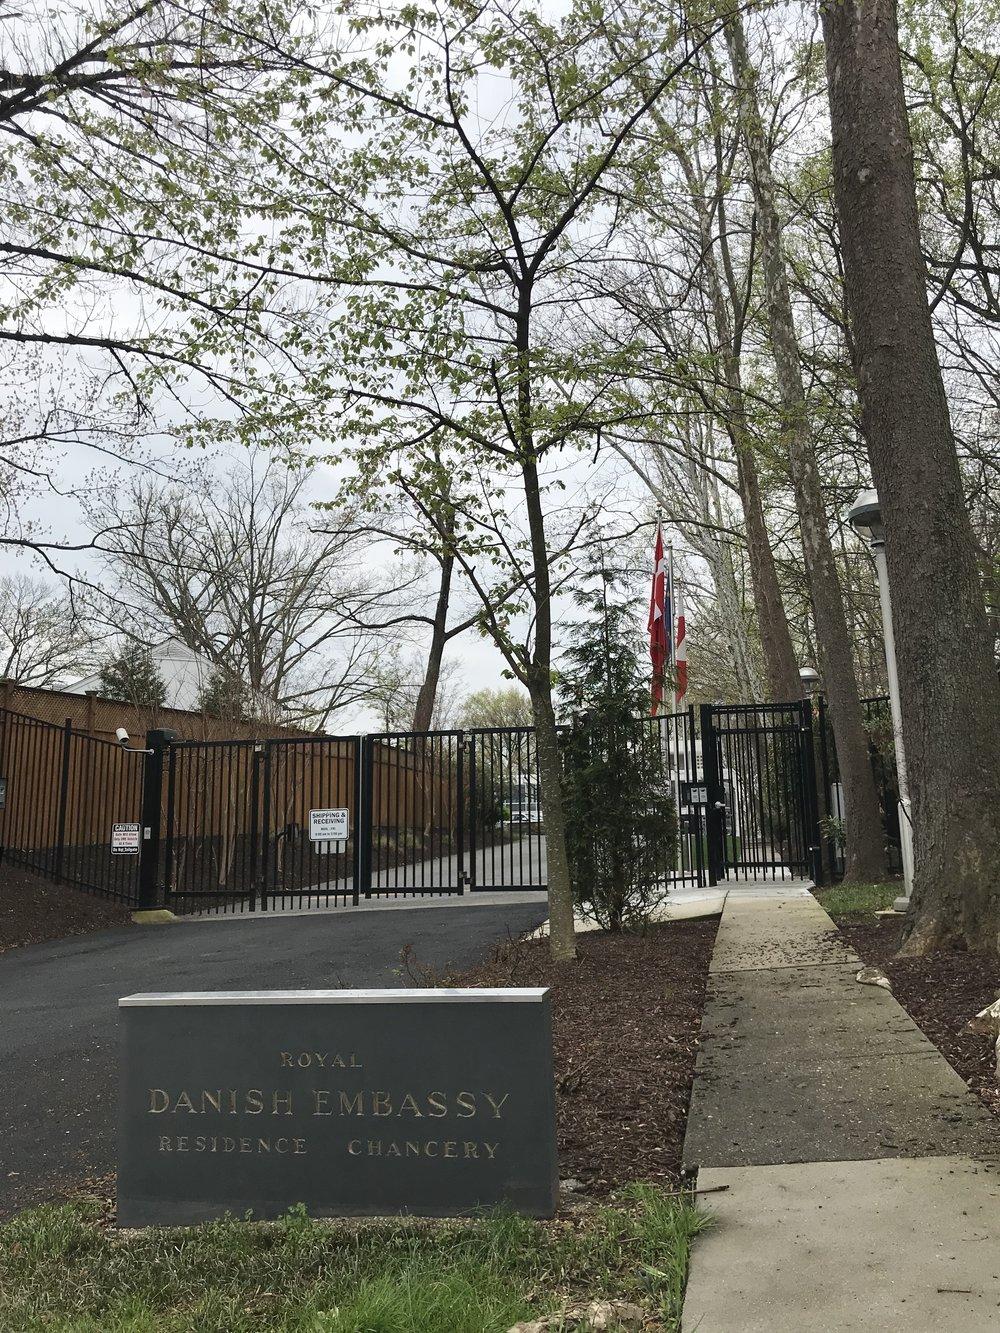 The Royal Danish Embassy.